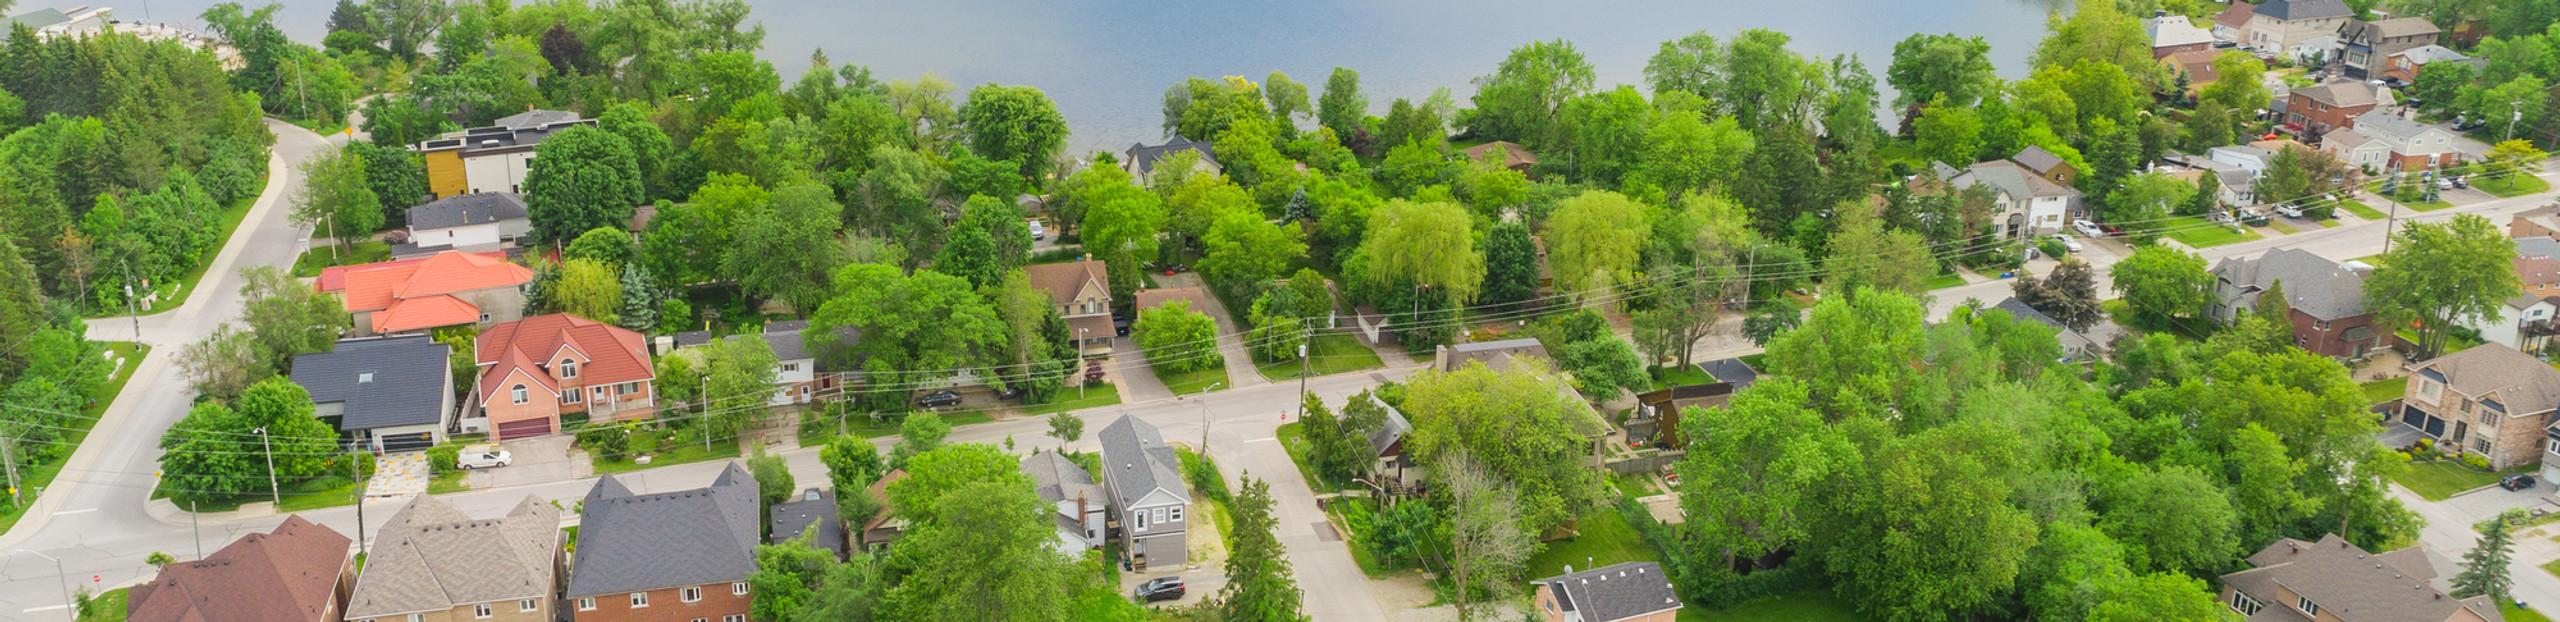 Lot Size Highlight In Neighborhood